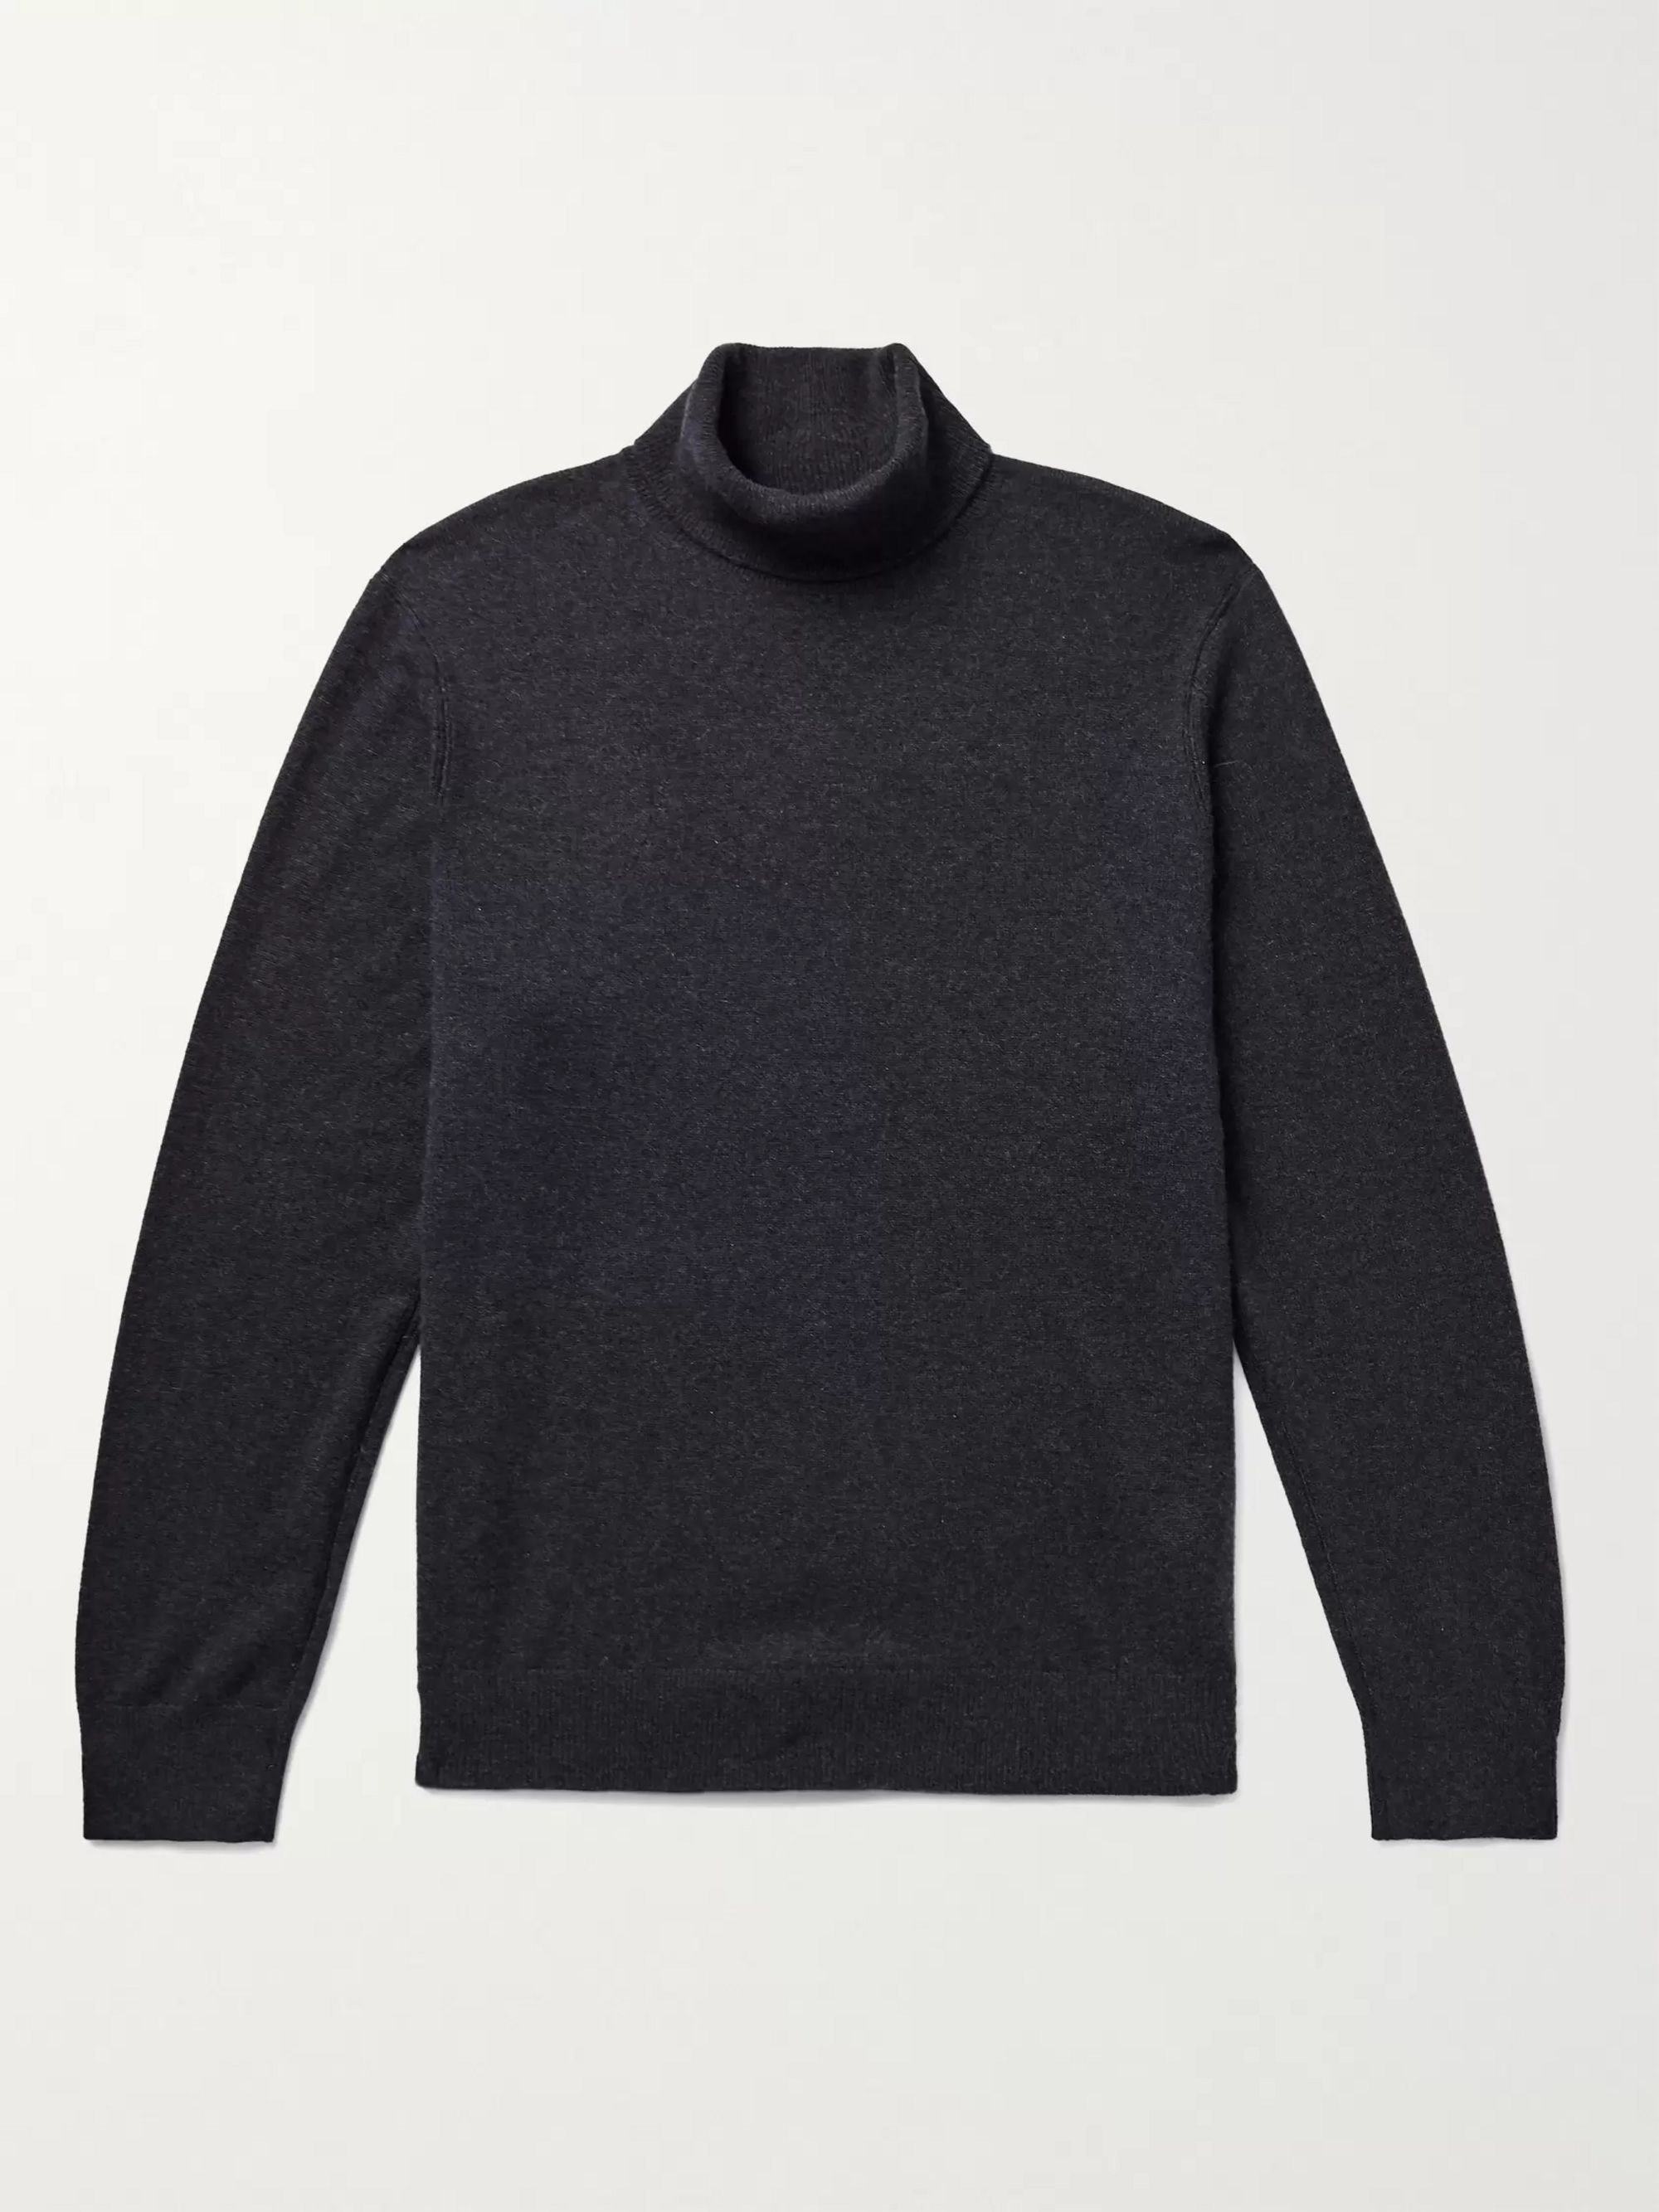 CLUB MONACO Melange Cashmere Rollneck Sweater